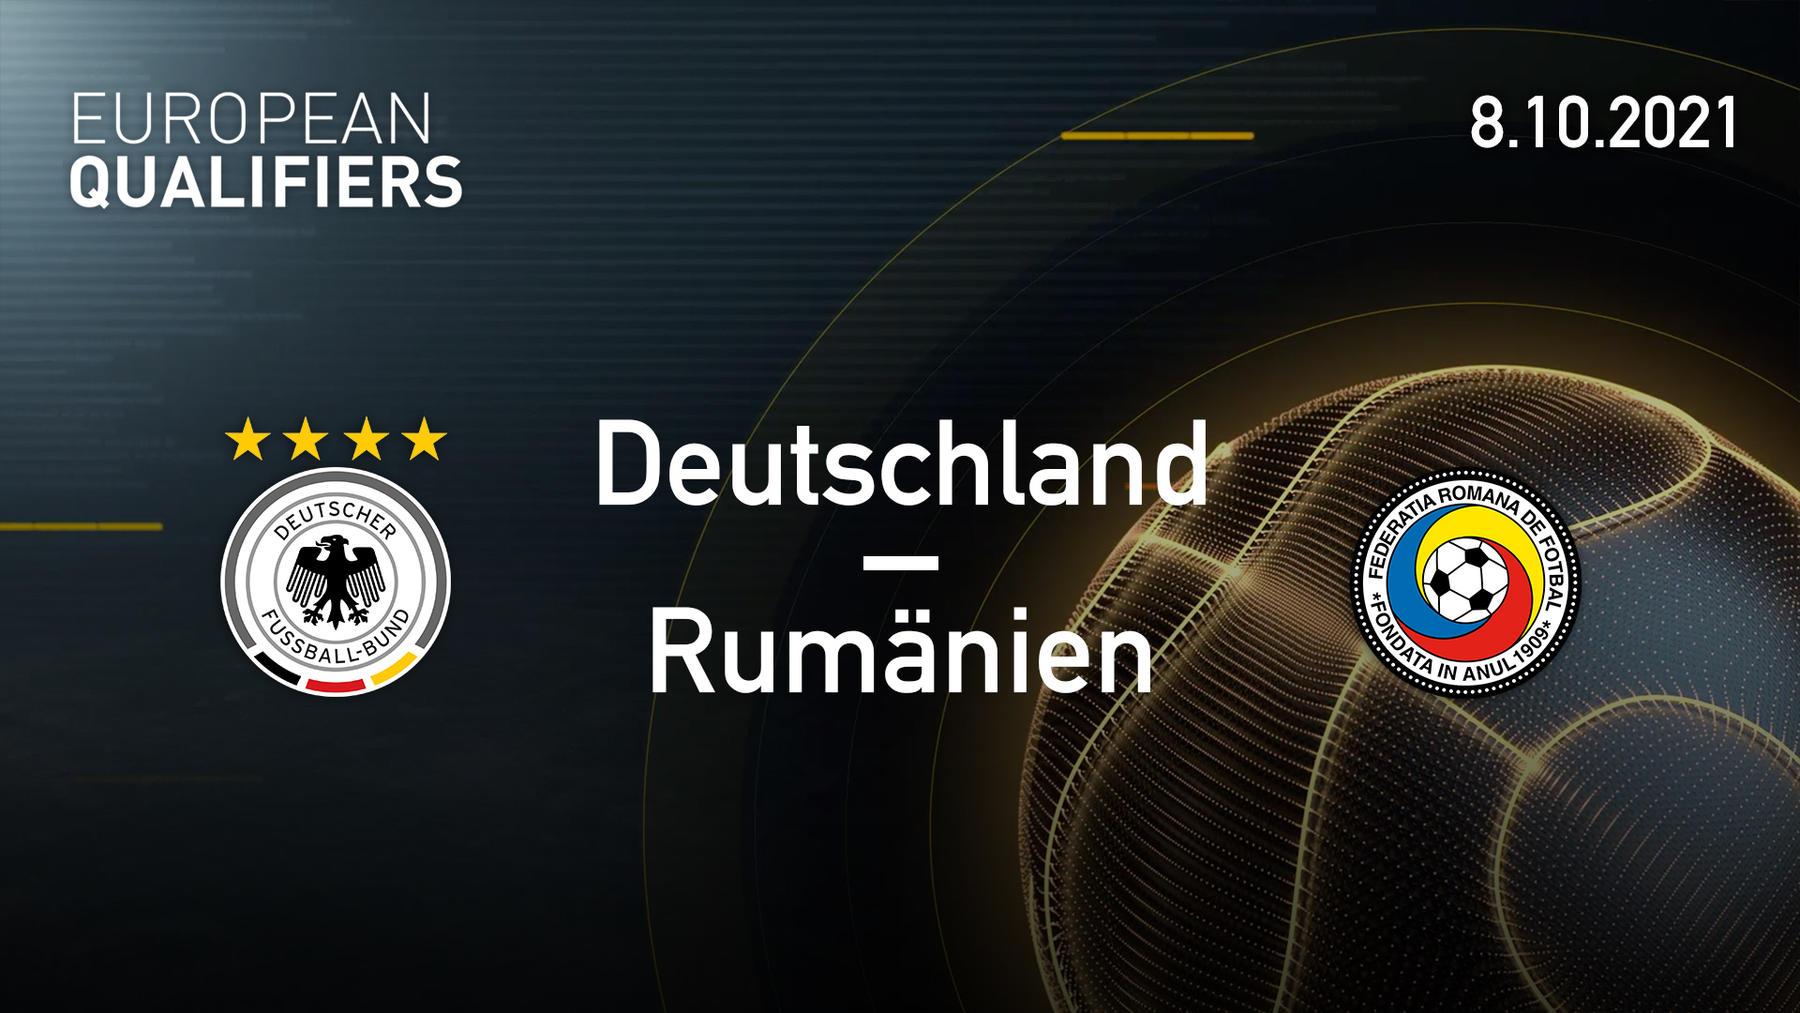 08.10.2021 - Deutschland vs. Rumänien